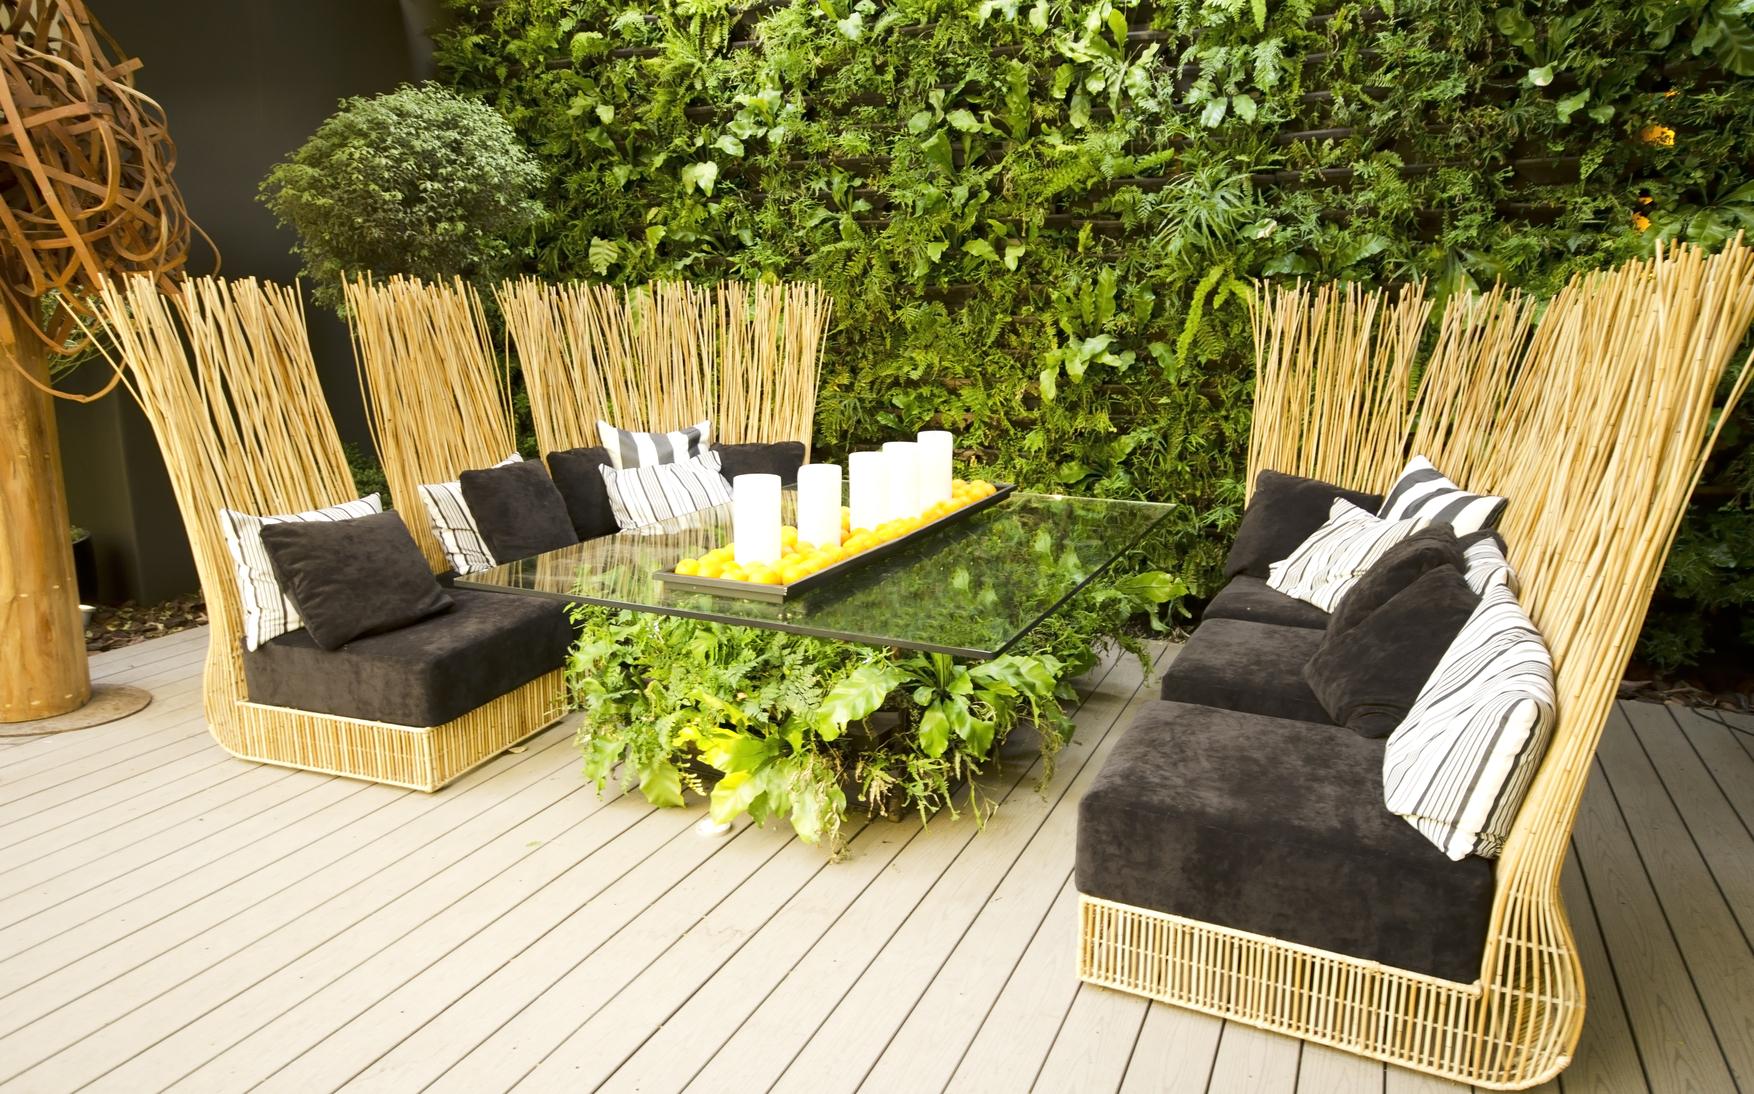 Excepcional Terrazas Zen Foto - Ideas de Decoración de Interiores ...